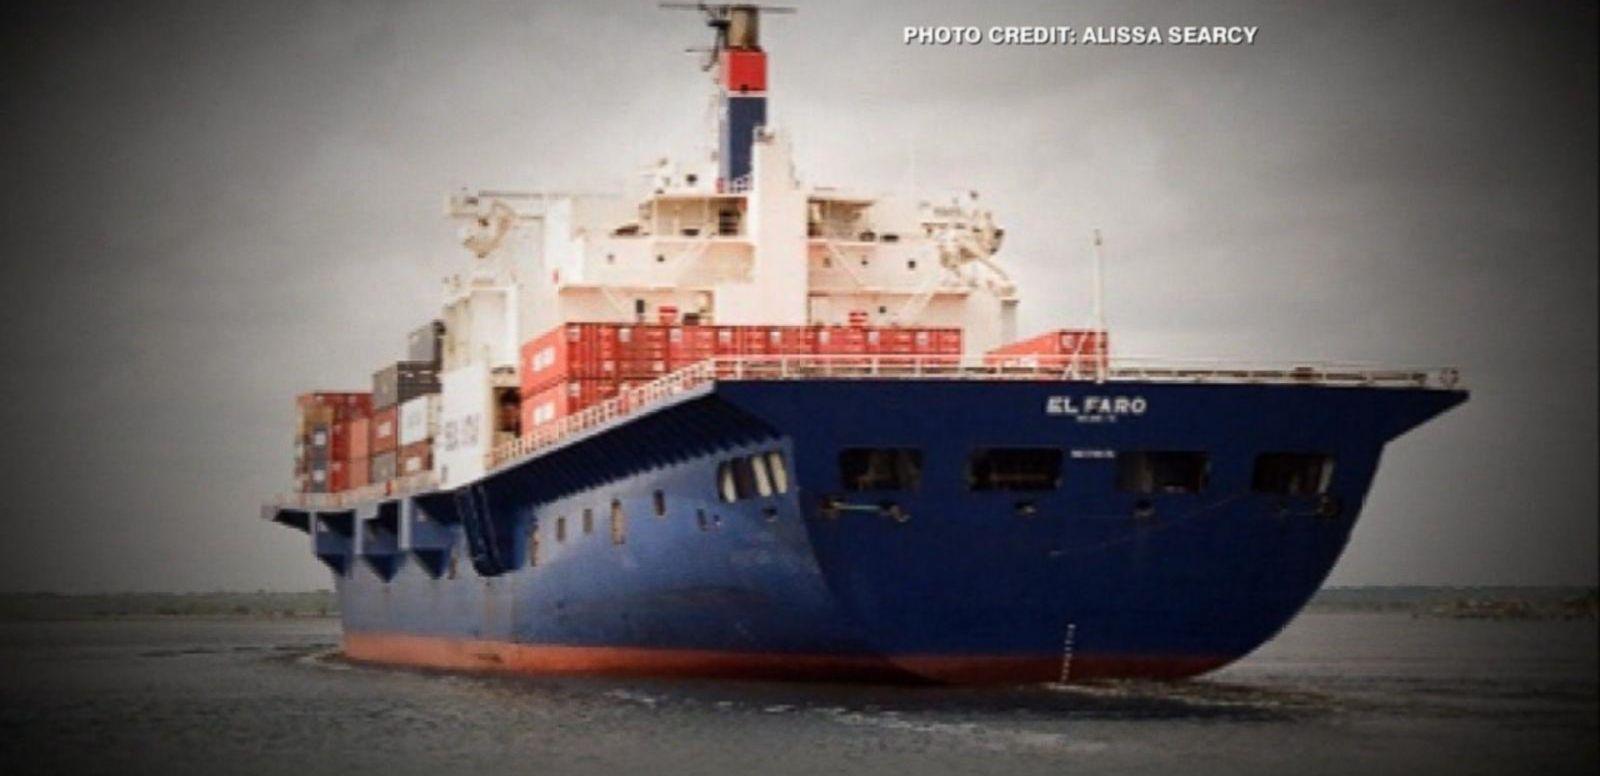 VIDEO: Cargo Ship Disappears Near Hurricane Joaquin